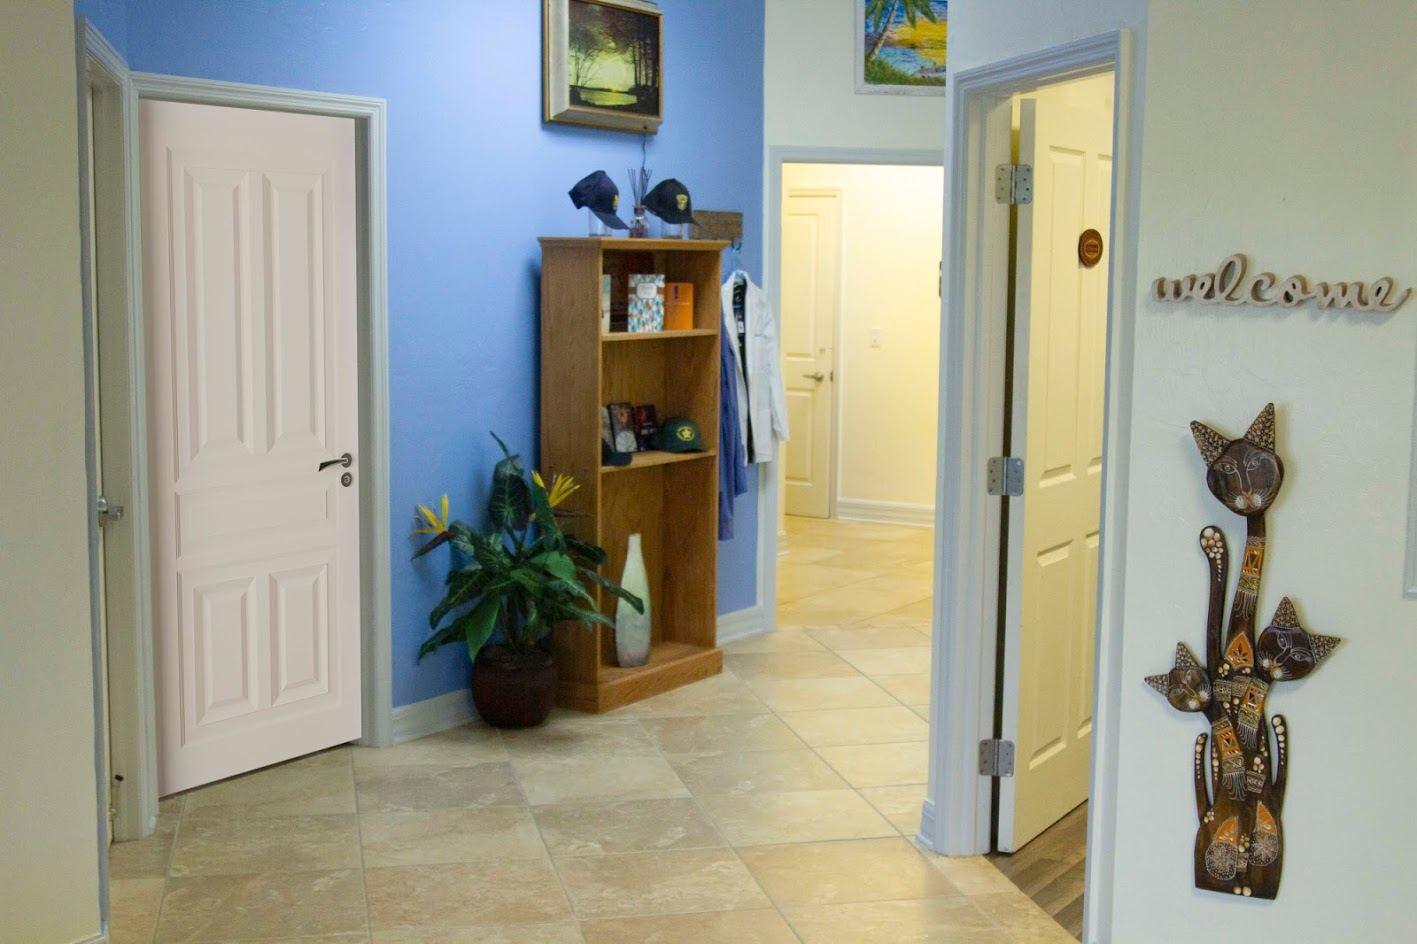 Office Internal View 1